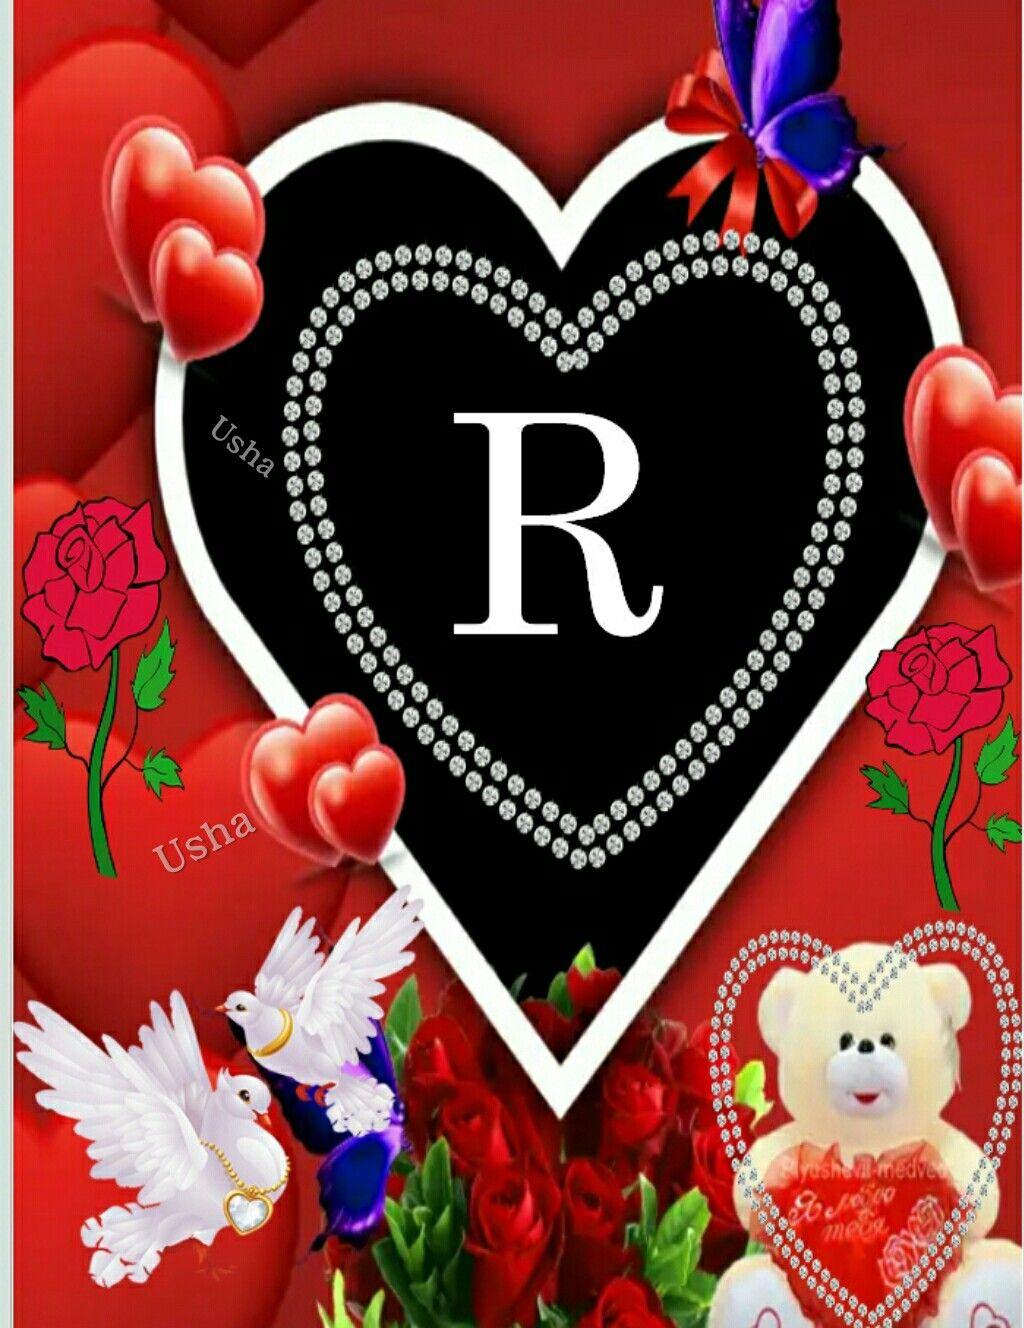 Name Letters, Girl Wallpaper, Black Girls, Style Fashion, - Heart S Letter Love New Wallpapers For Girls , HD Wallpaper & Backgrounds